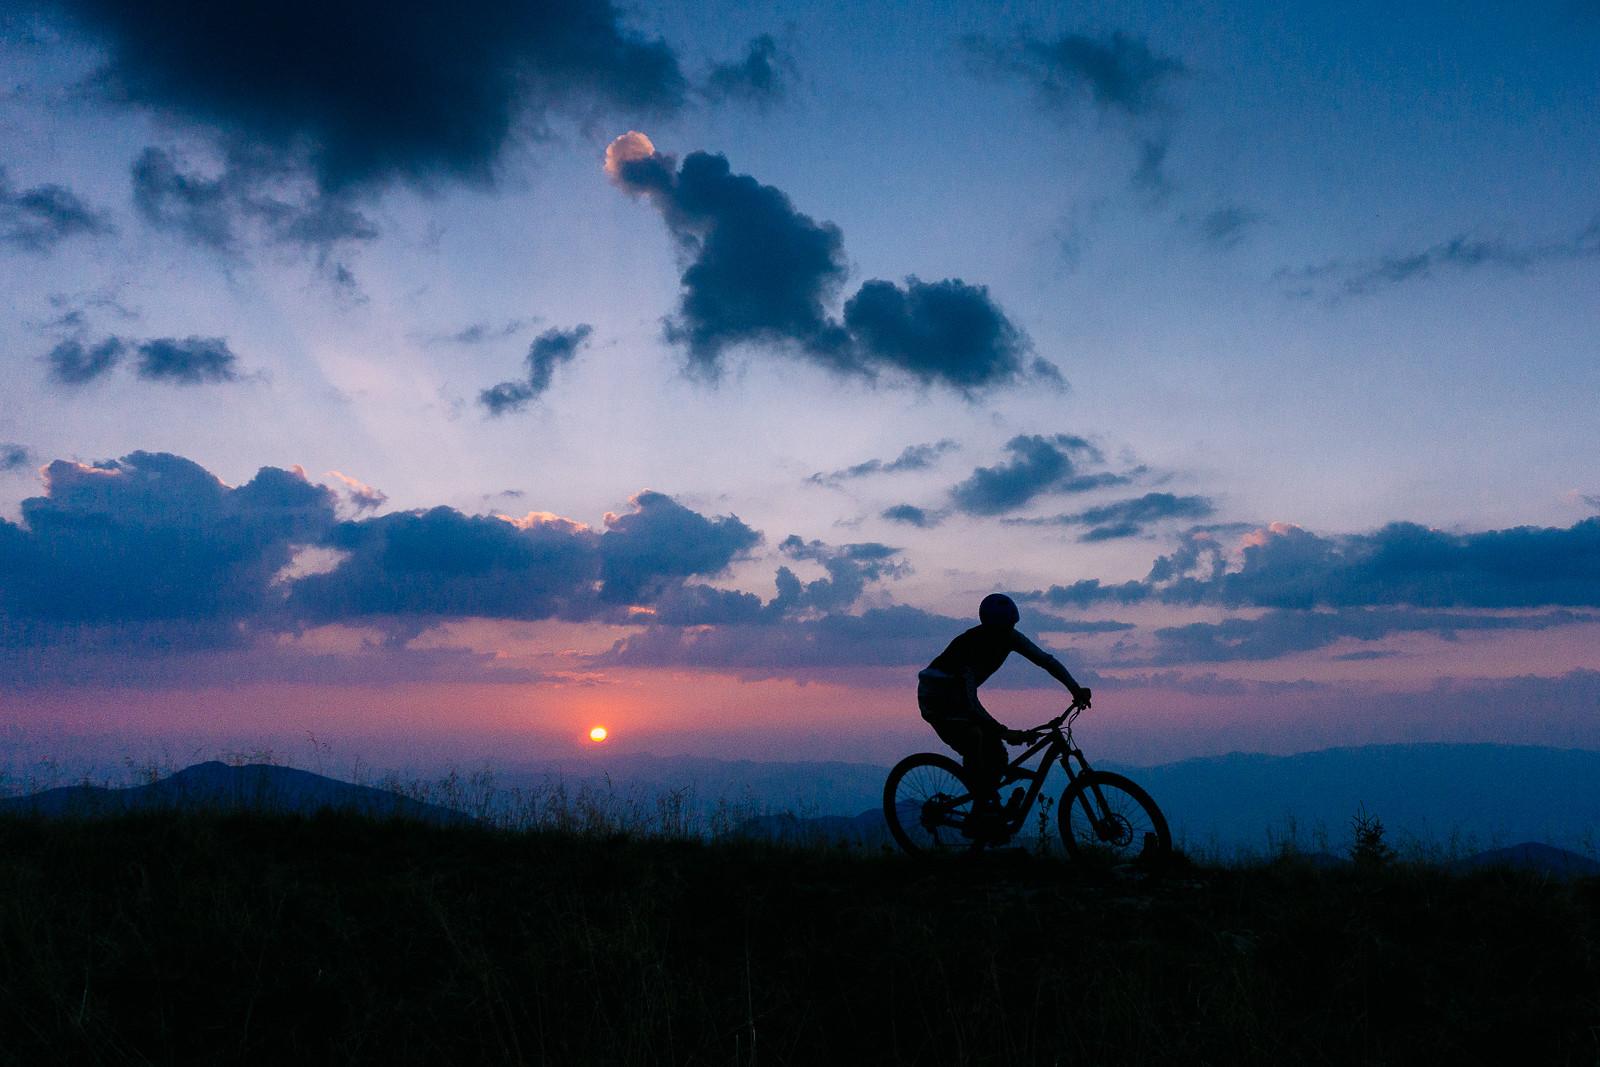 Those late summer rides - EWIA - Mountain Biking Pictures - Vital MTB